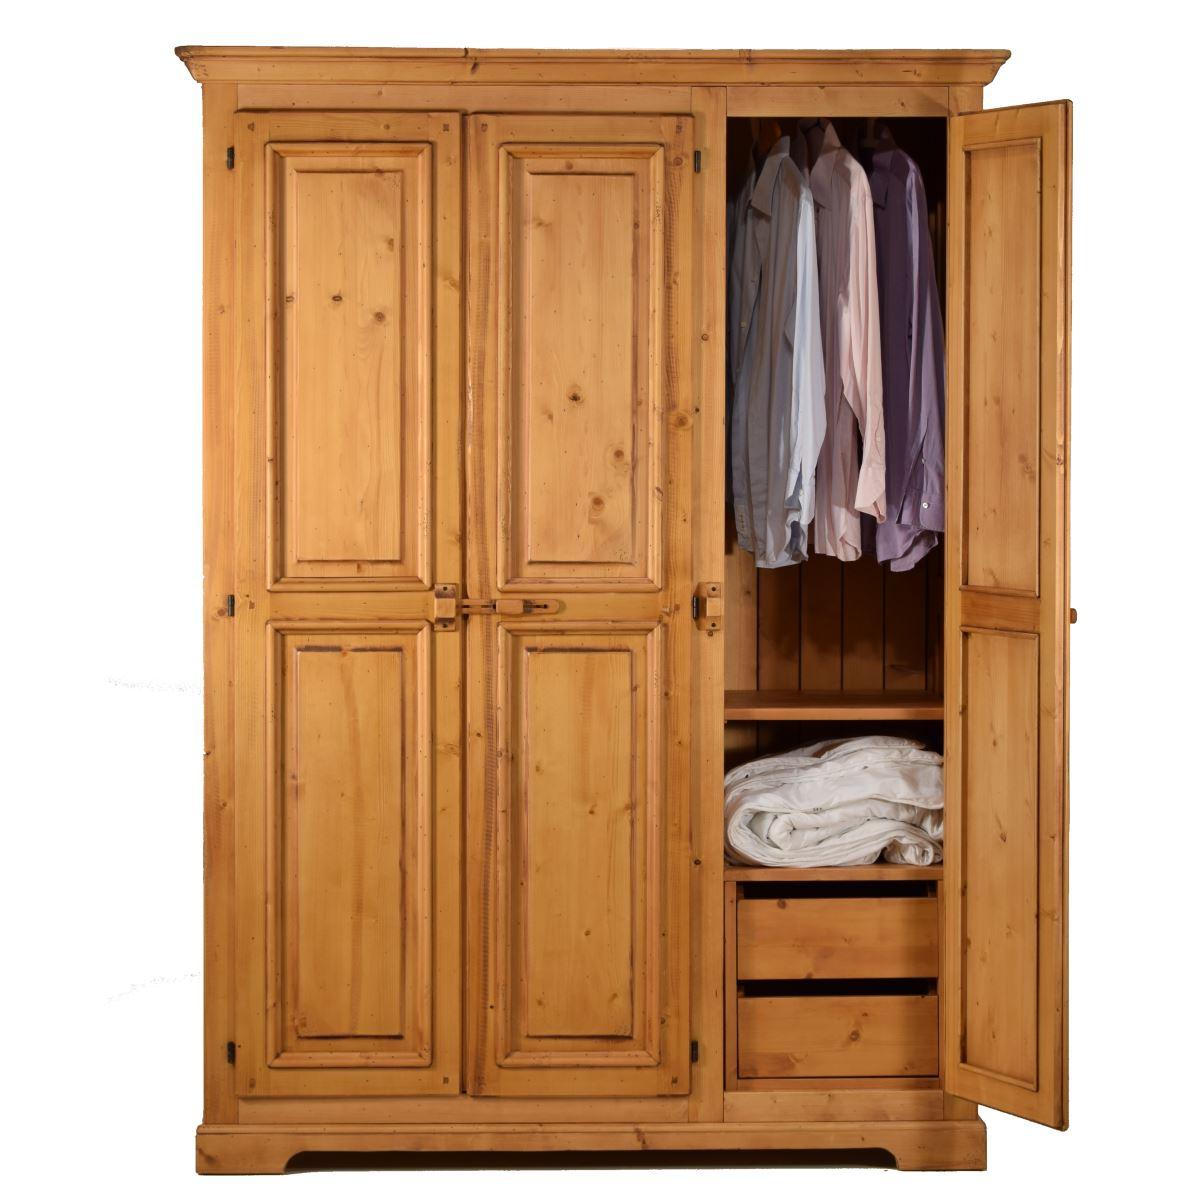 Armario r stico de madera en tres puertas ecor stico for Armarios de madera baratos